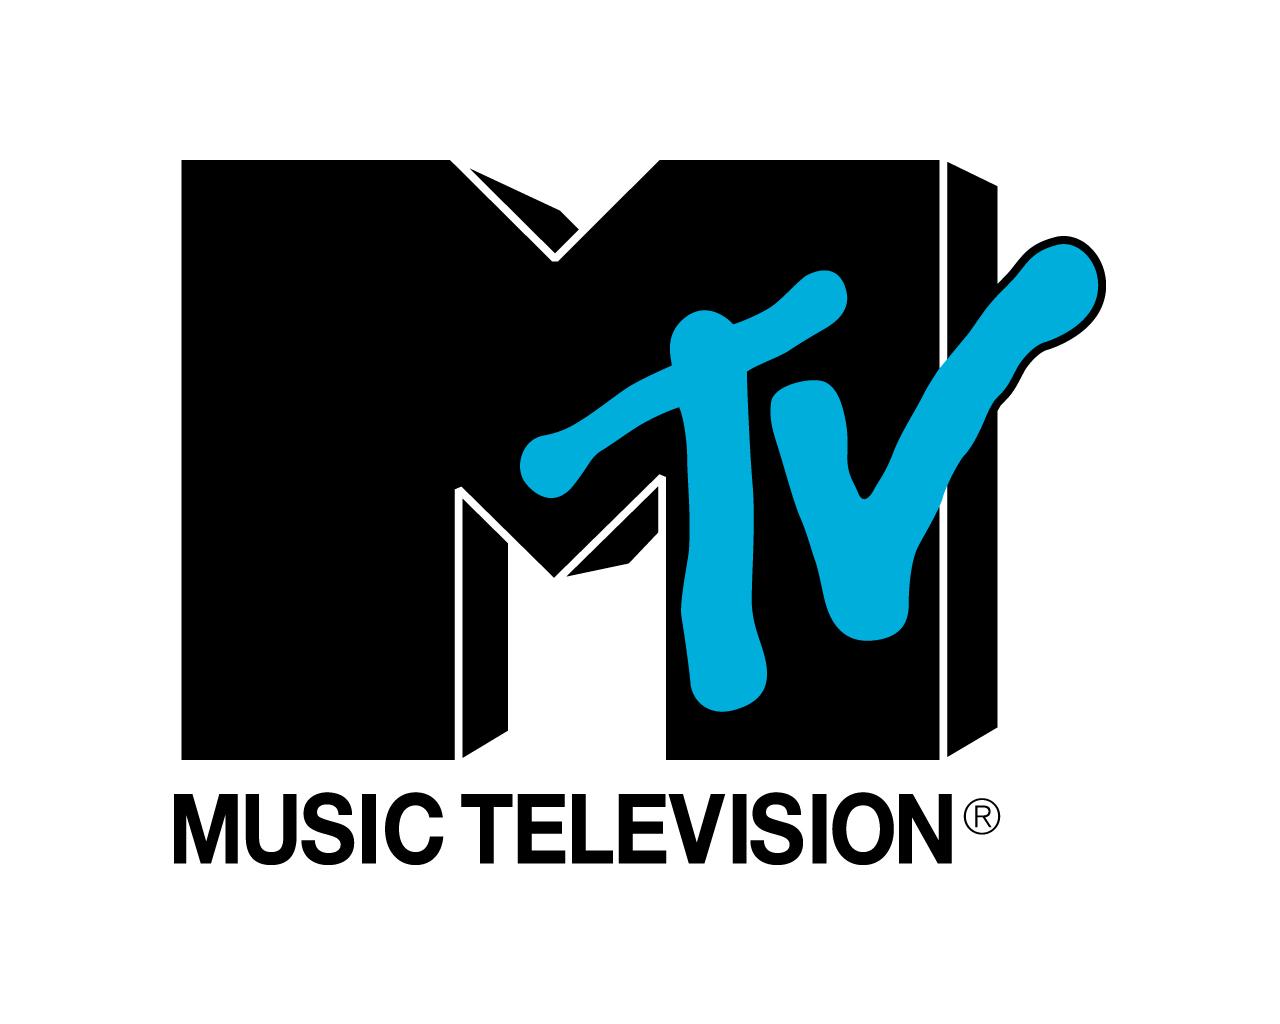 mtv-logo.jpg